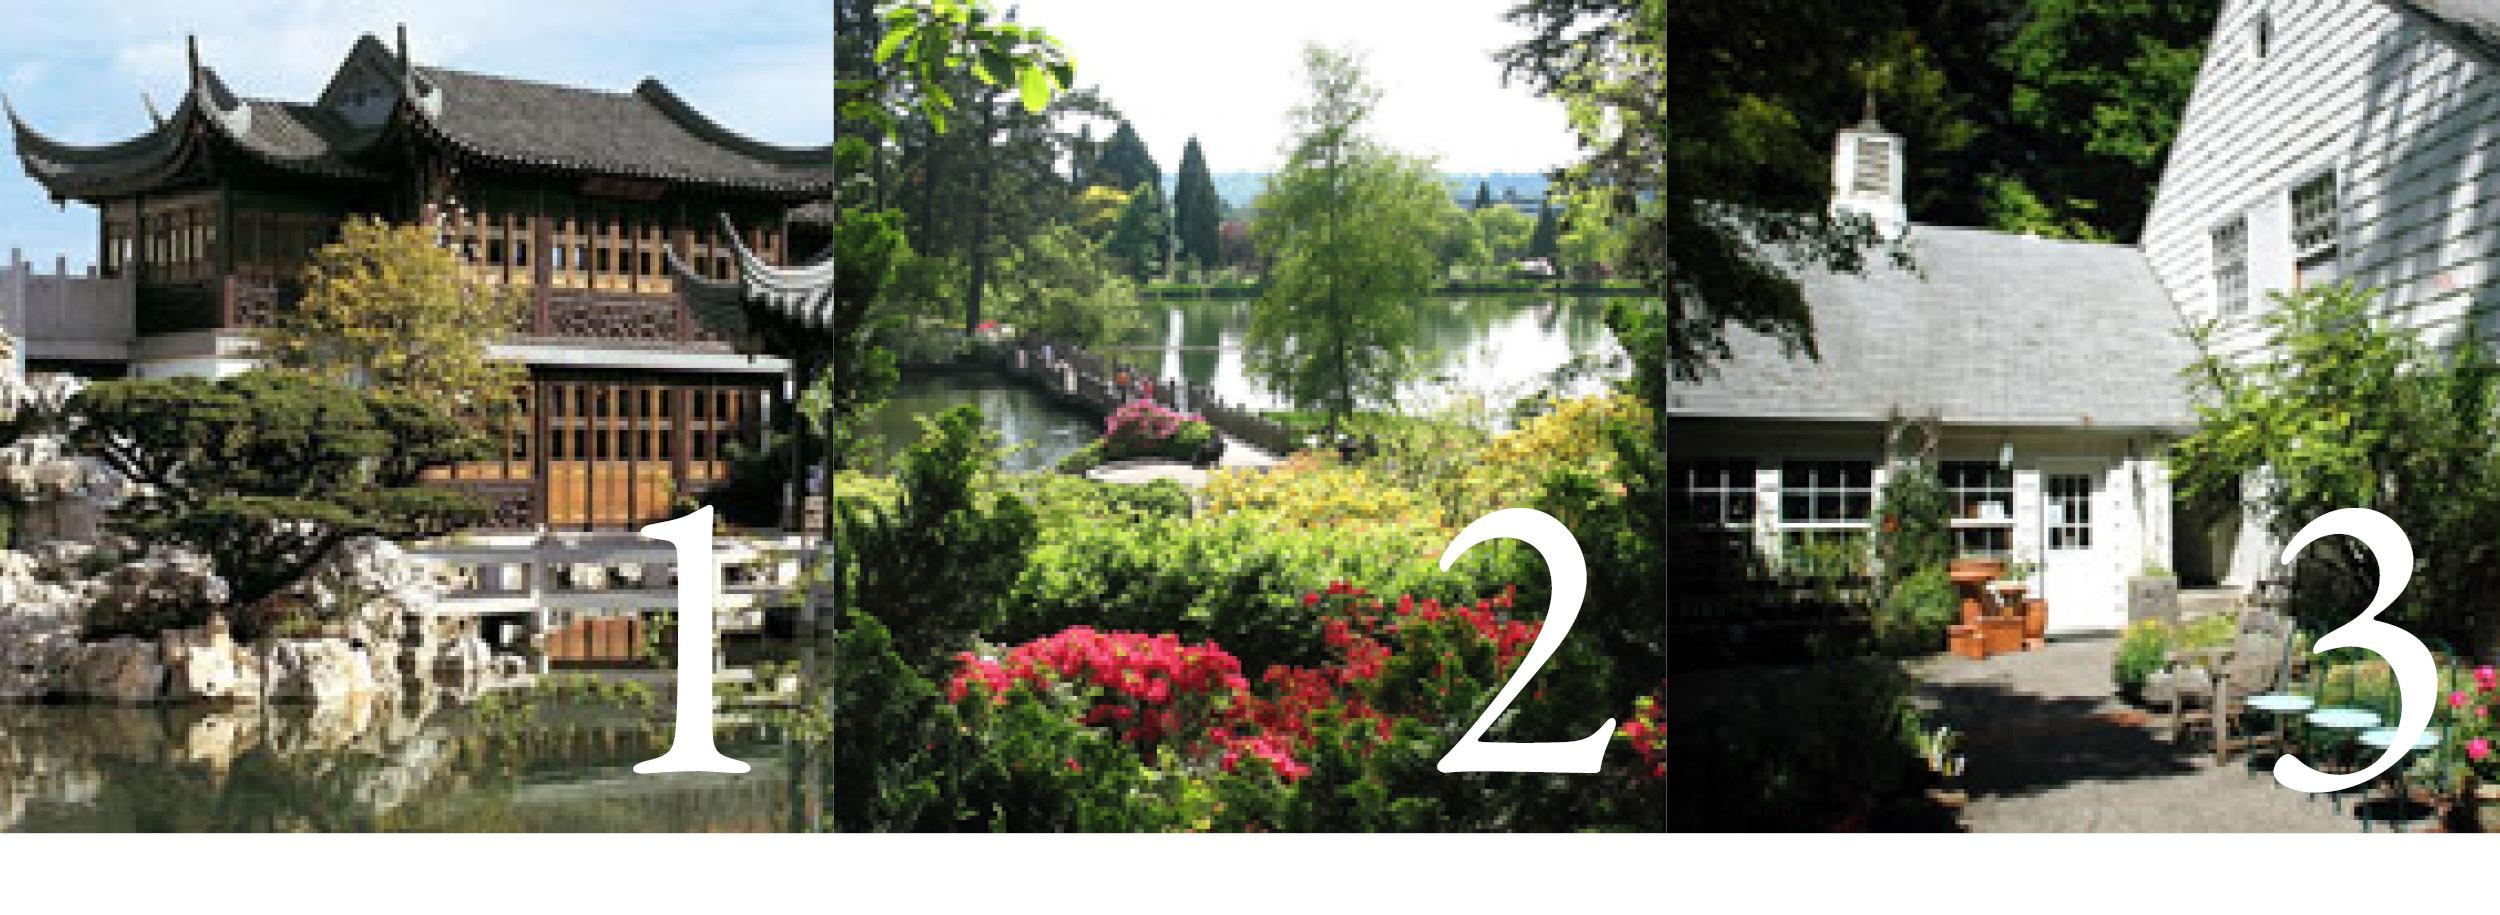 Photos courtesy Portland Parks & Recreation